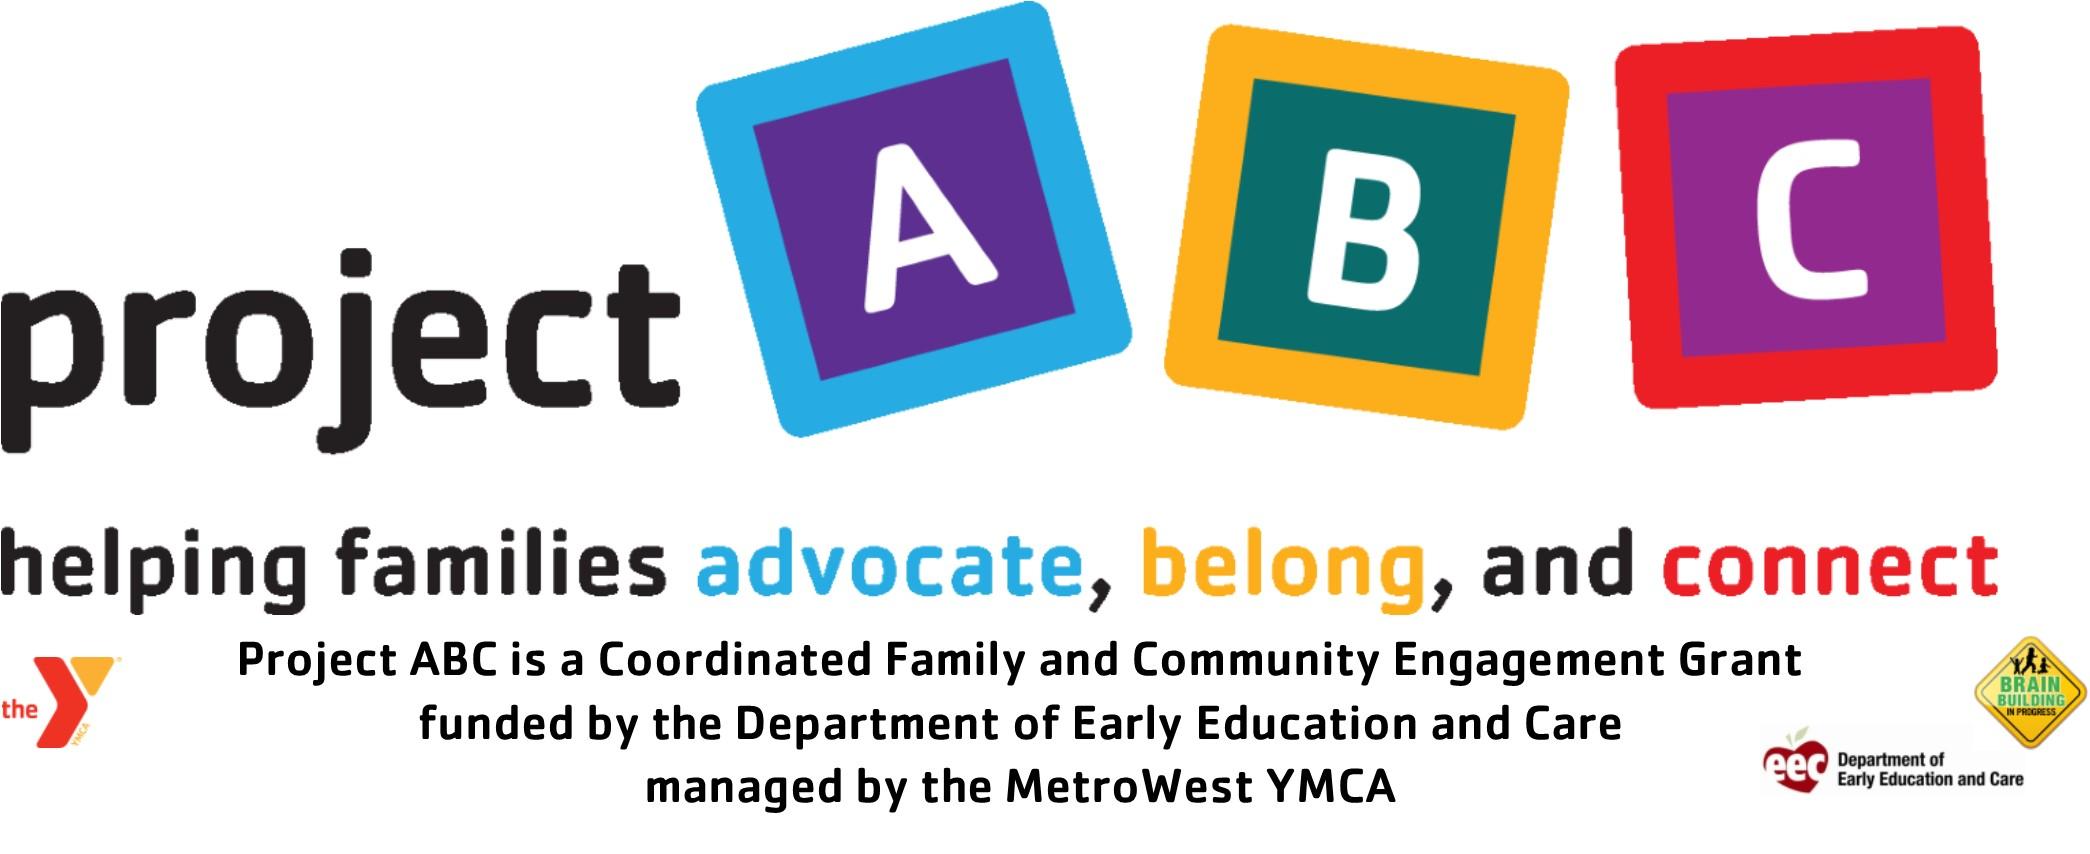 Project ABC | Metrowest YMCA | MetroWest YMCA